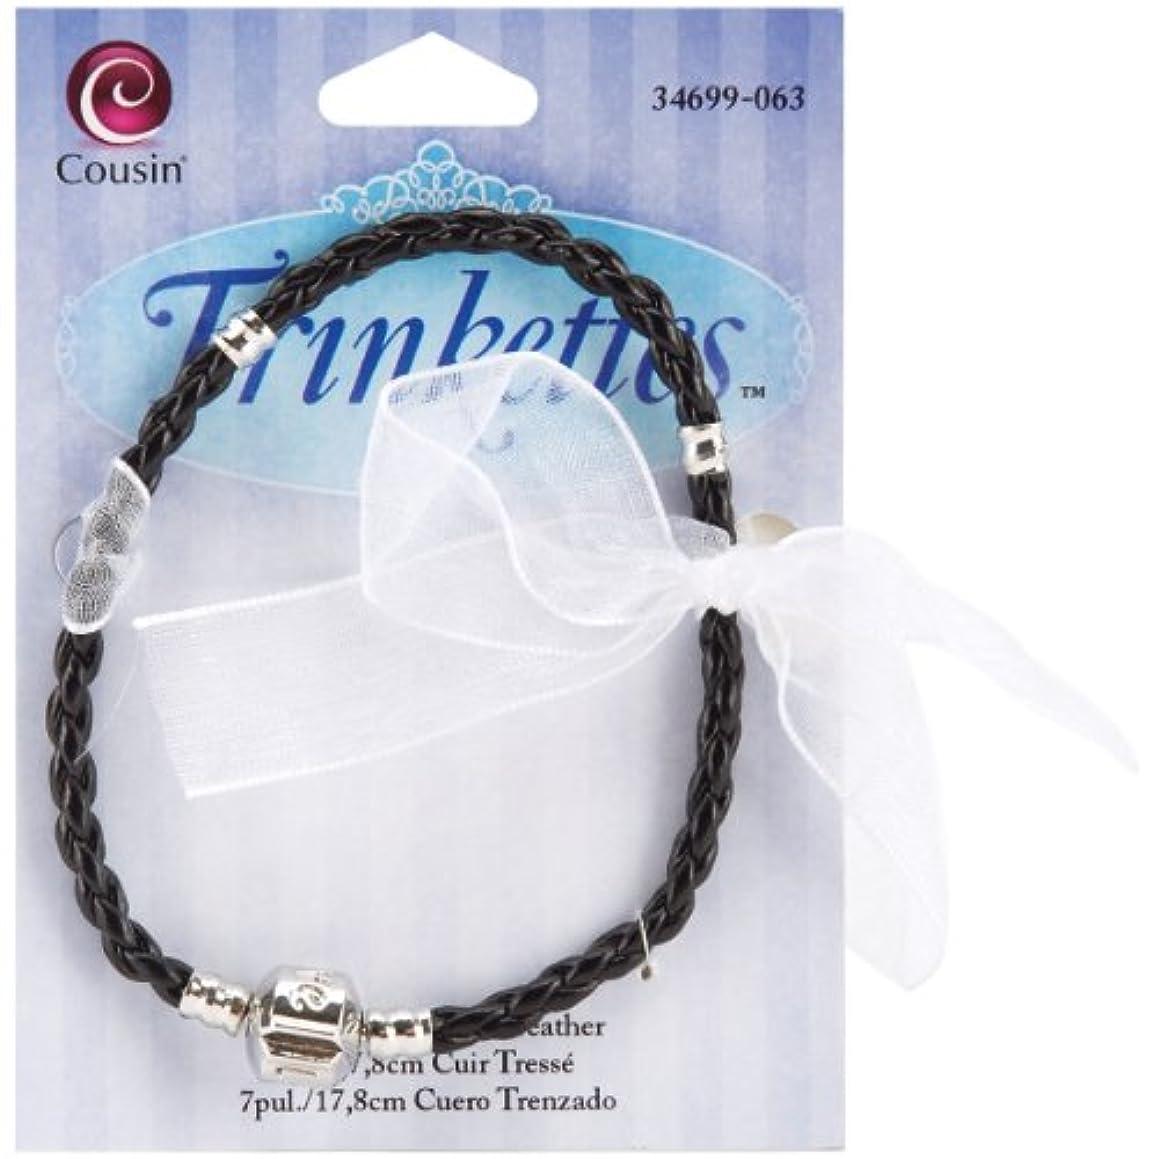 Cousin Trinkettes 7-1/2-Inch/20cm Braided Leather Bracelet